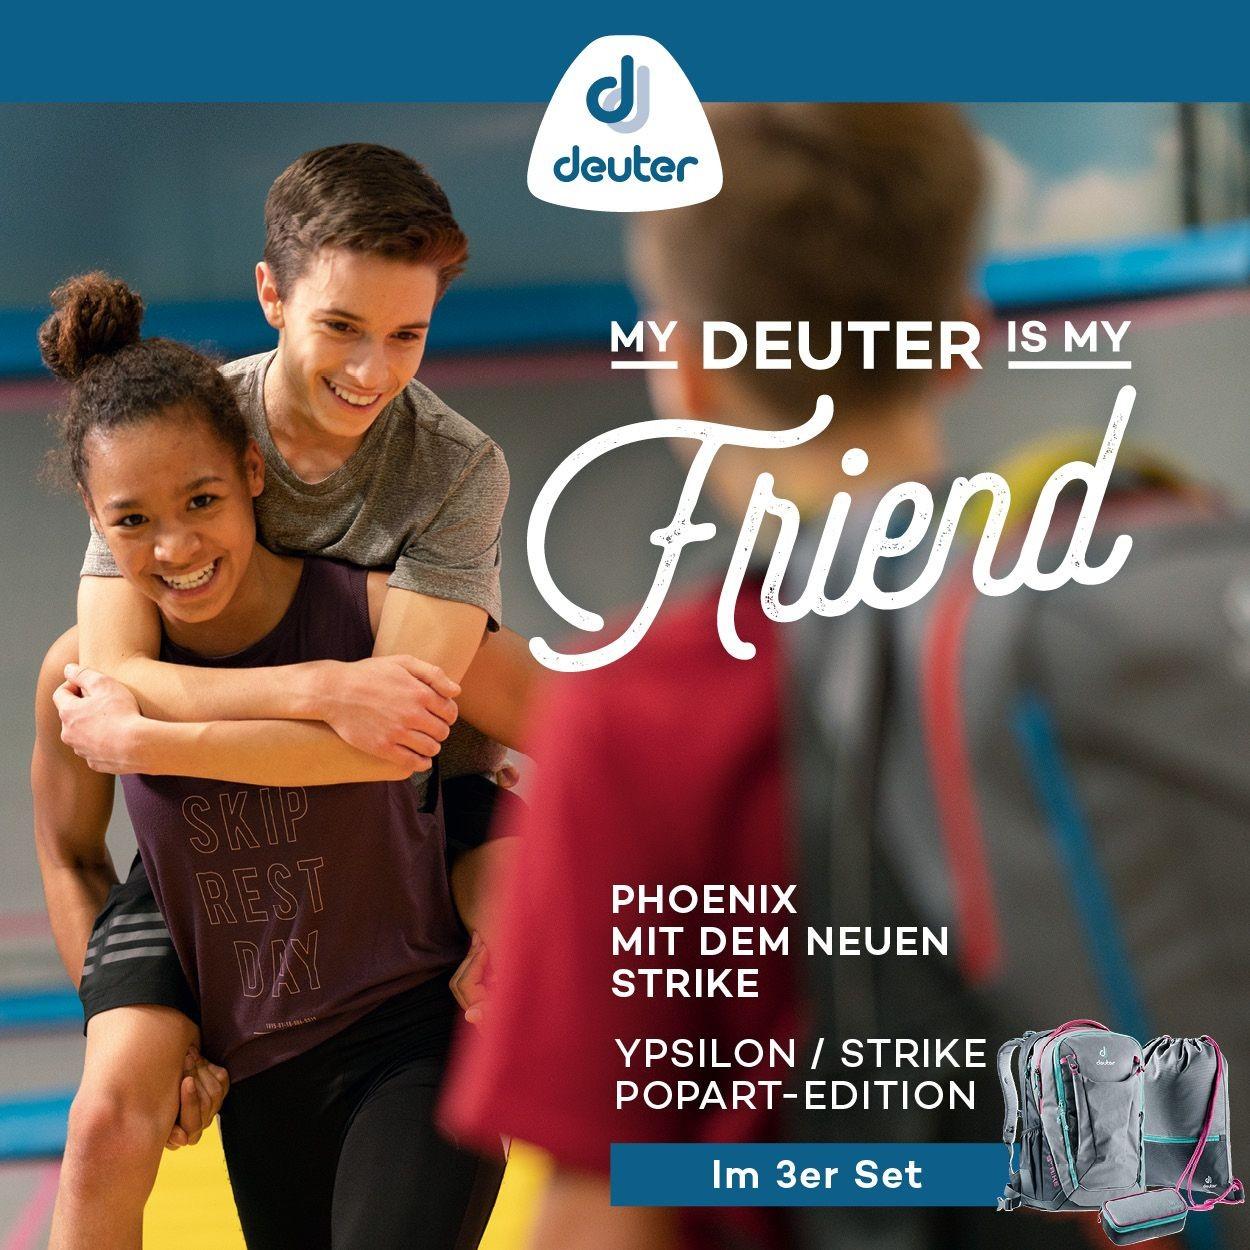 Deuter Pop Art Limited Edition